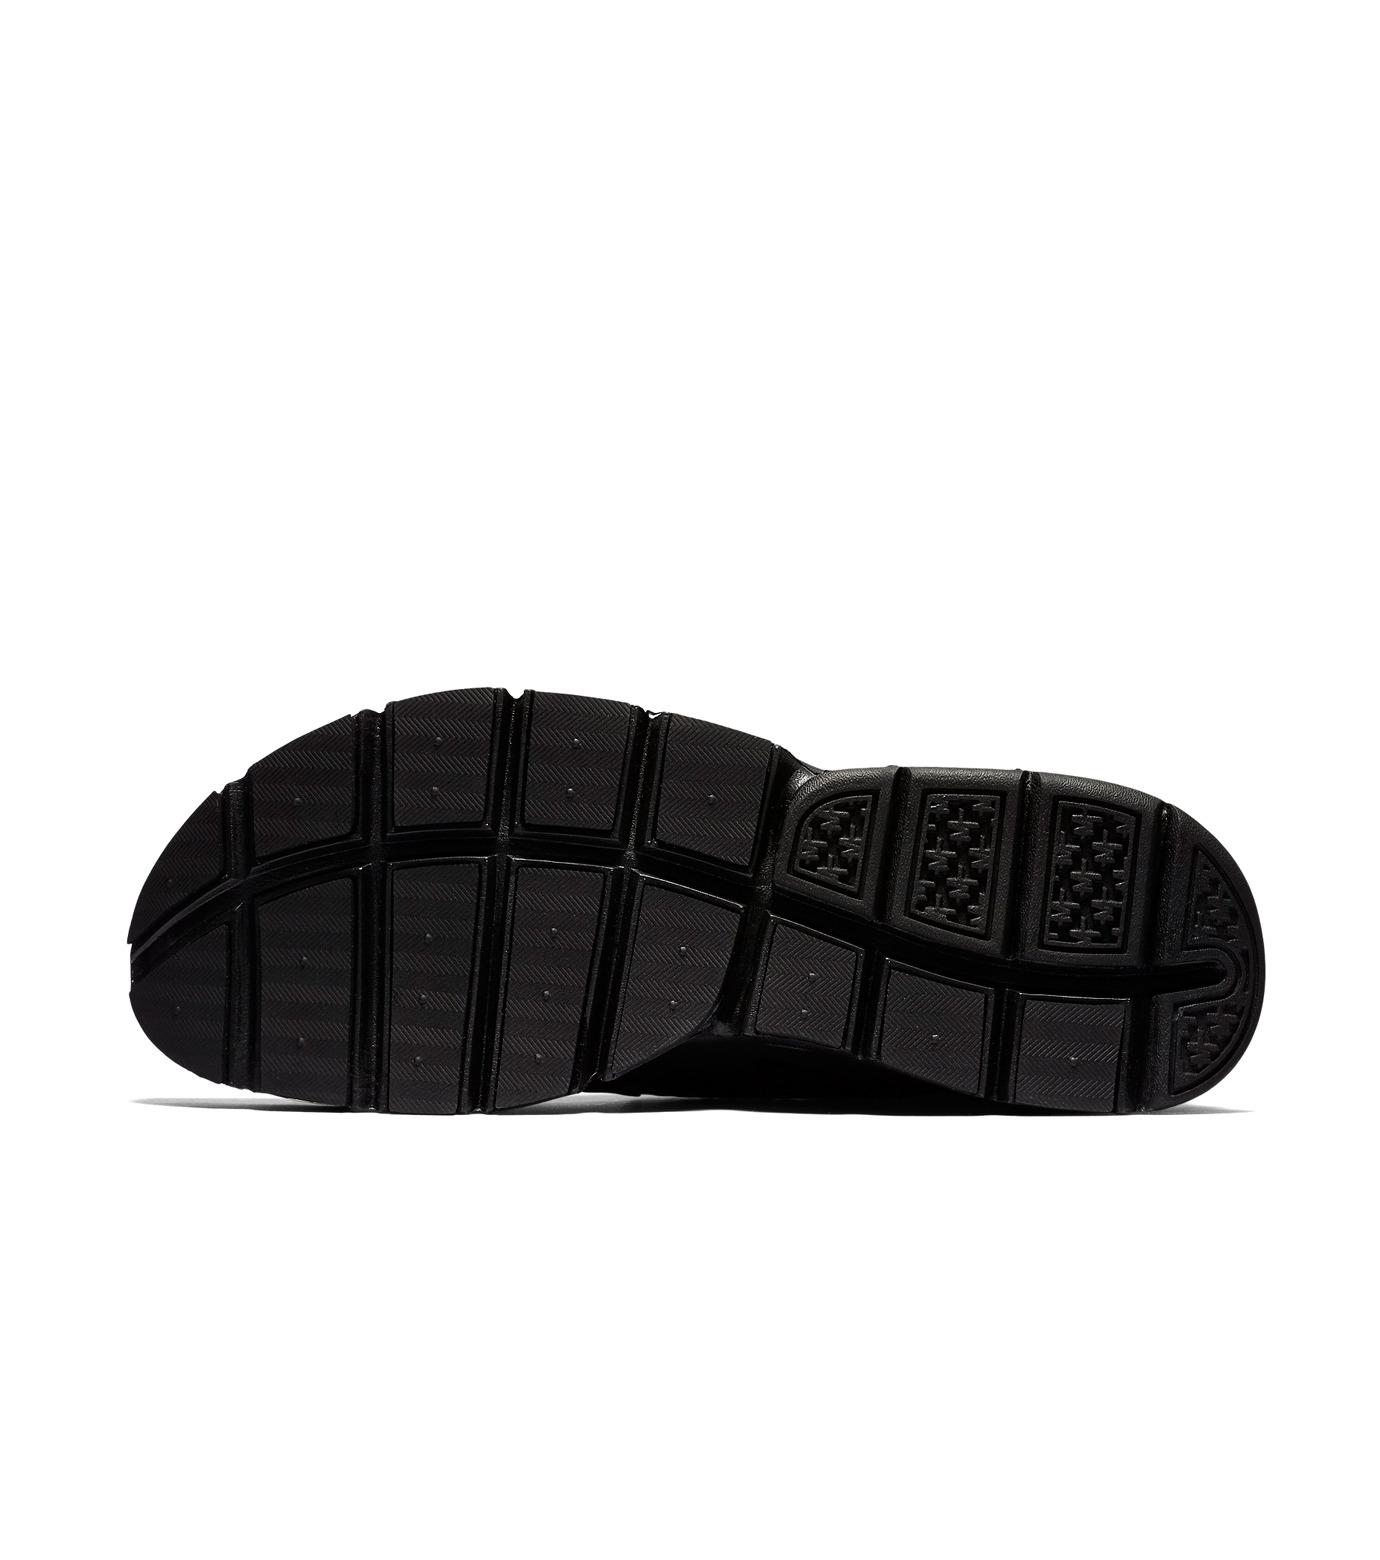 NIKE(ナイキ)のSOCK DART-BLACK(シューズ/shoes)-819686-001-13 拡大詳細画像2